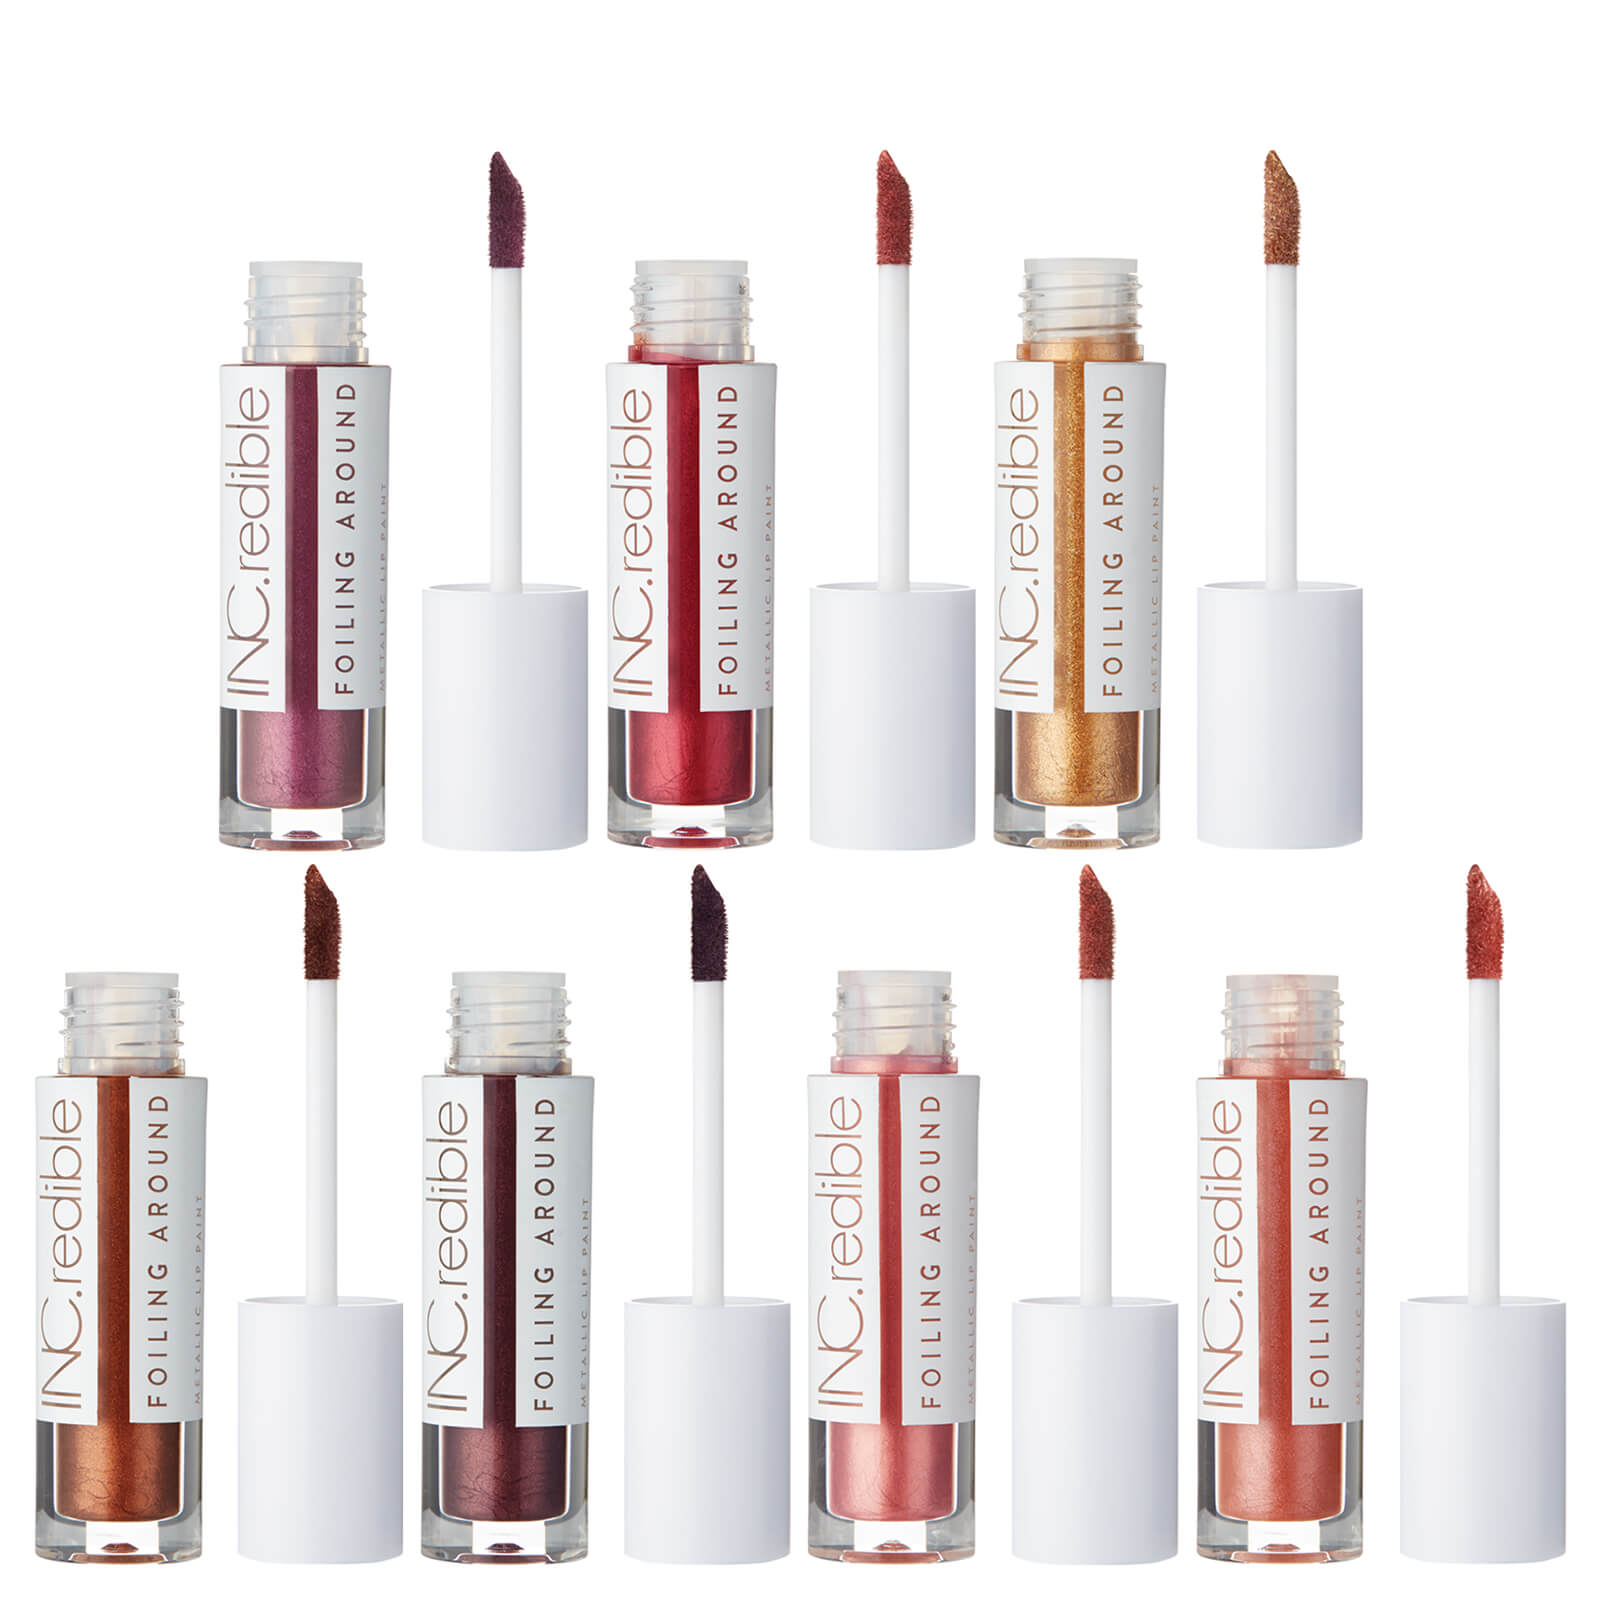 Inc Redible Foiling Around Metallic Liquid Lipstick Various Shades Buy Online Mankind